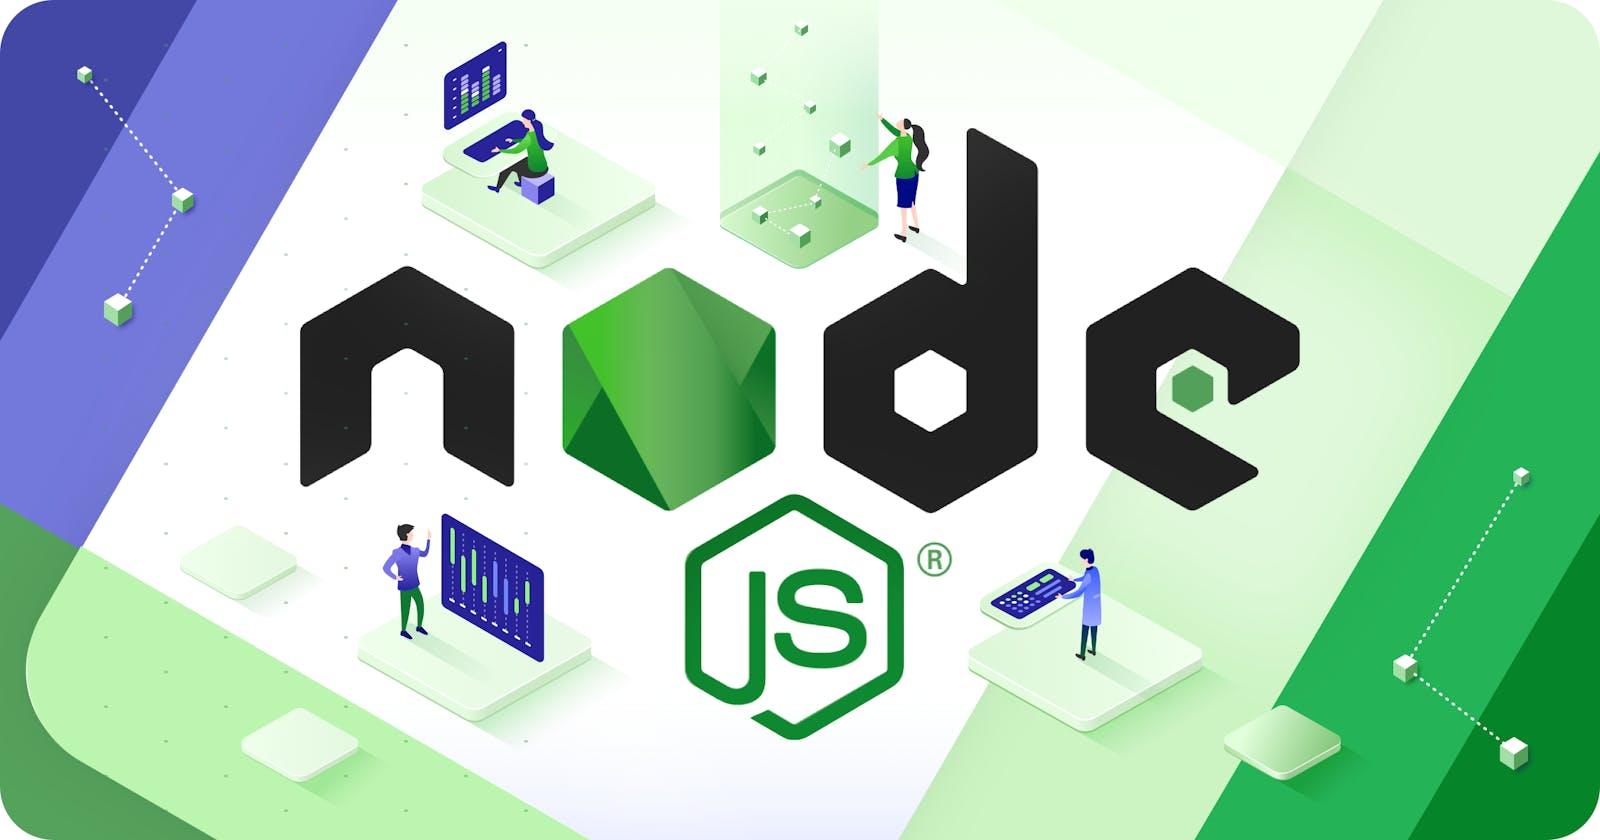 How to setup URL domain in local development using NodeJs